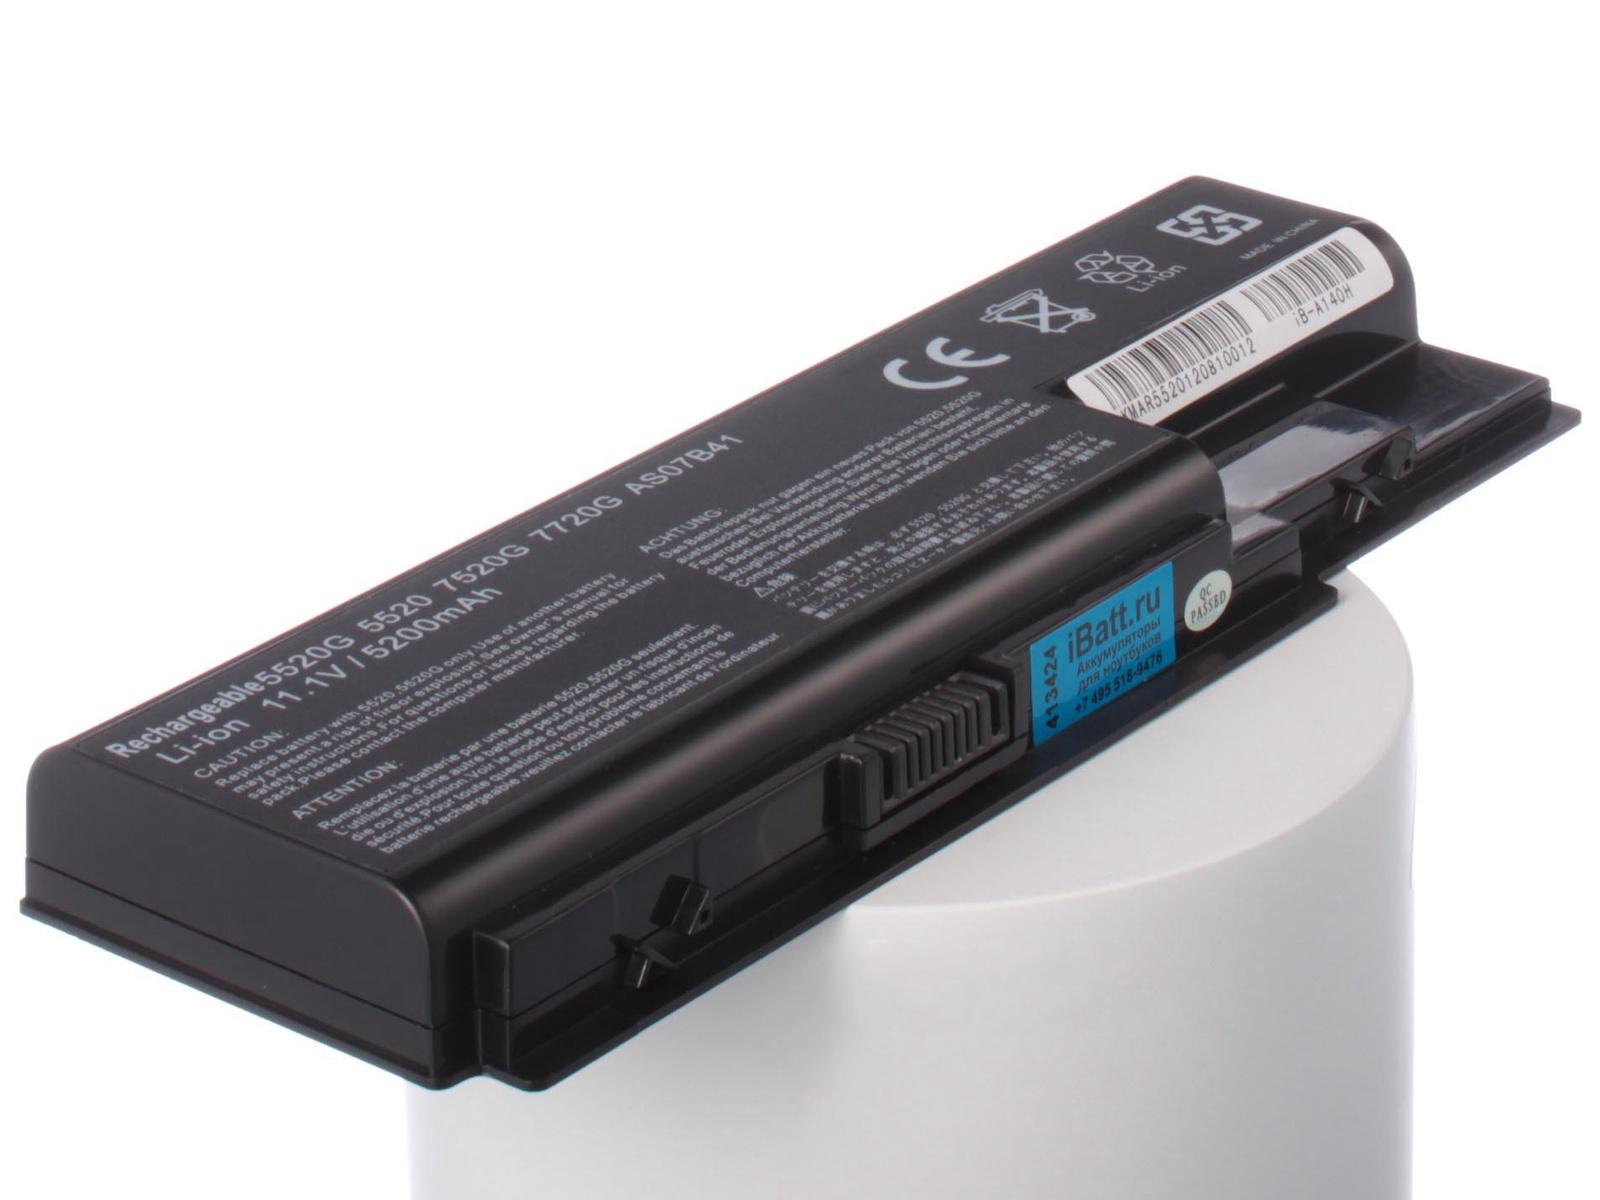 Аккумулятор для ноутбука iBatt для Acer Aspire 5739G-664G32Mi, Aspire 5730G, Aspire 7735, Aspire 7735Z, Aspire 5739G-874G50Mi, Aspire 8942G-334G32Mi, Aspire 6930ZG, Aspire 5300, Aspire 5530G-803G25Mi, Aspire 5930Z ноутбук acer aspire 8942g